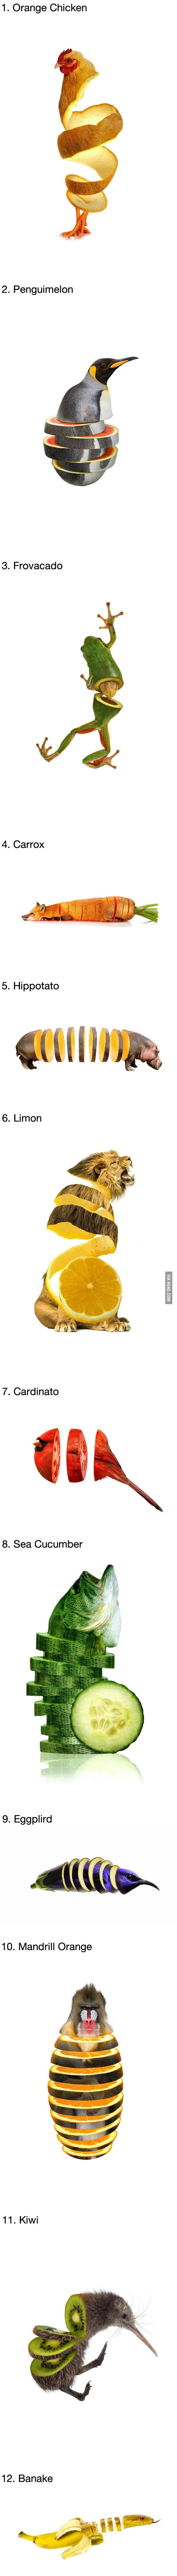 12 Strange Animals Photoshopped as Fruits and Vegetables